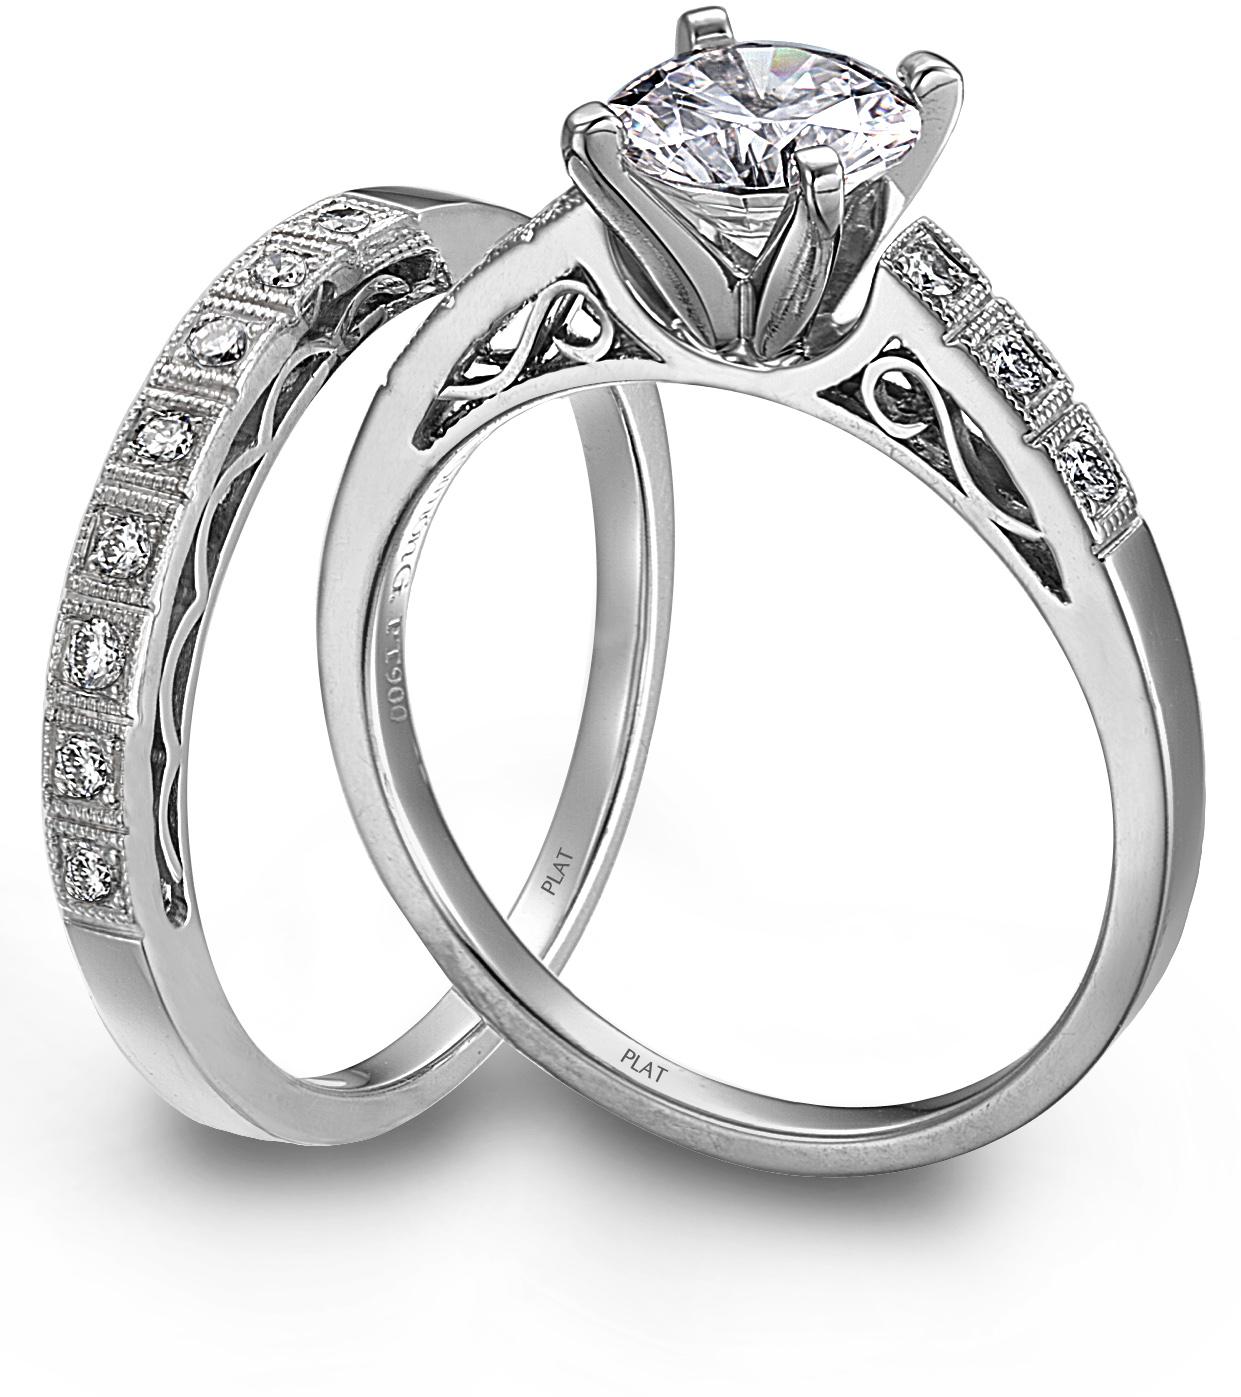 wedding engagement rings ... lrpvyhg